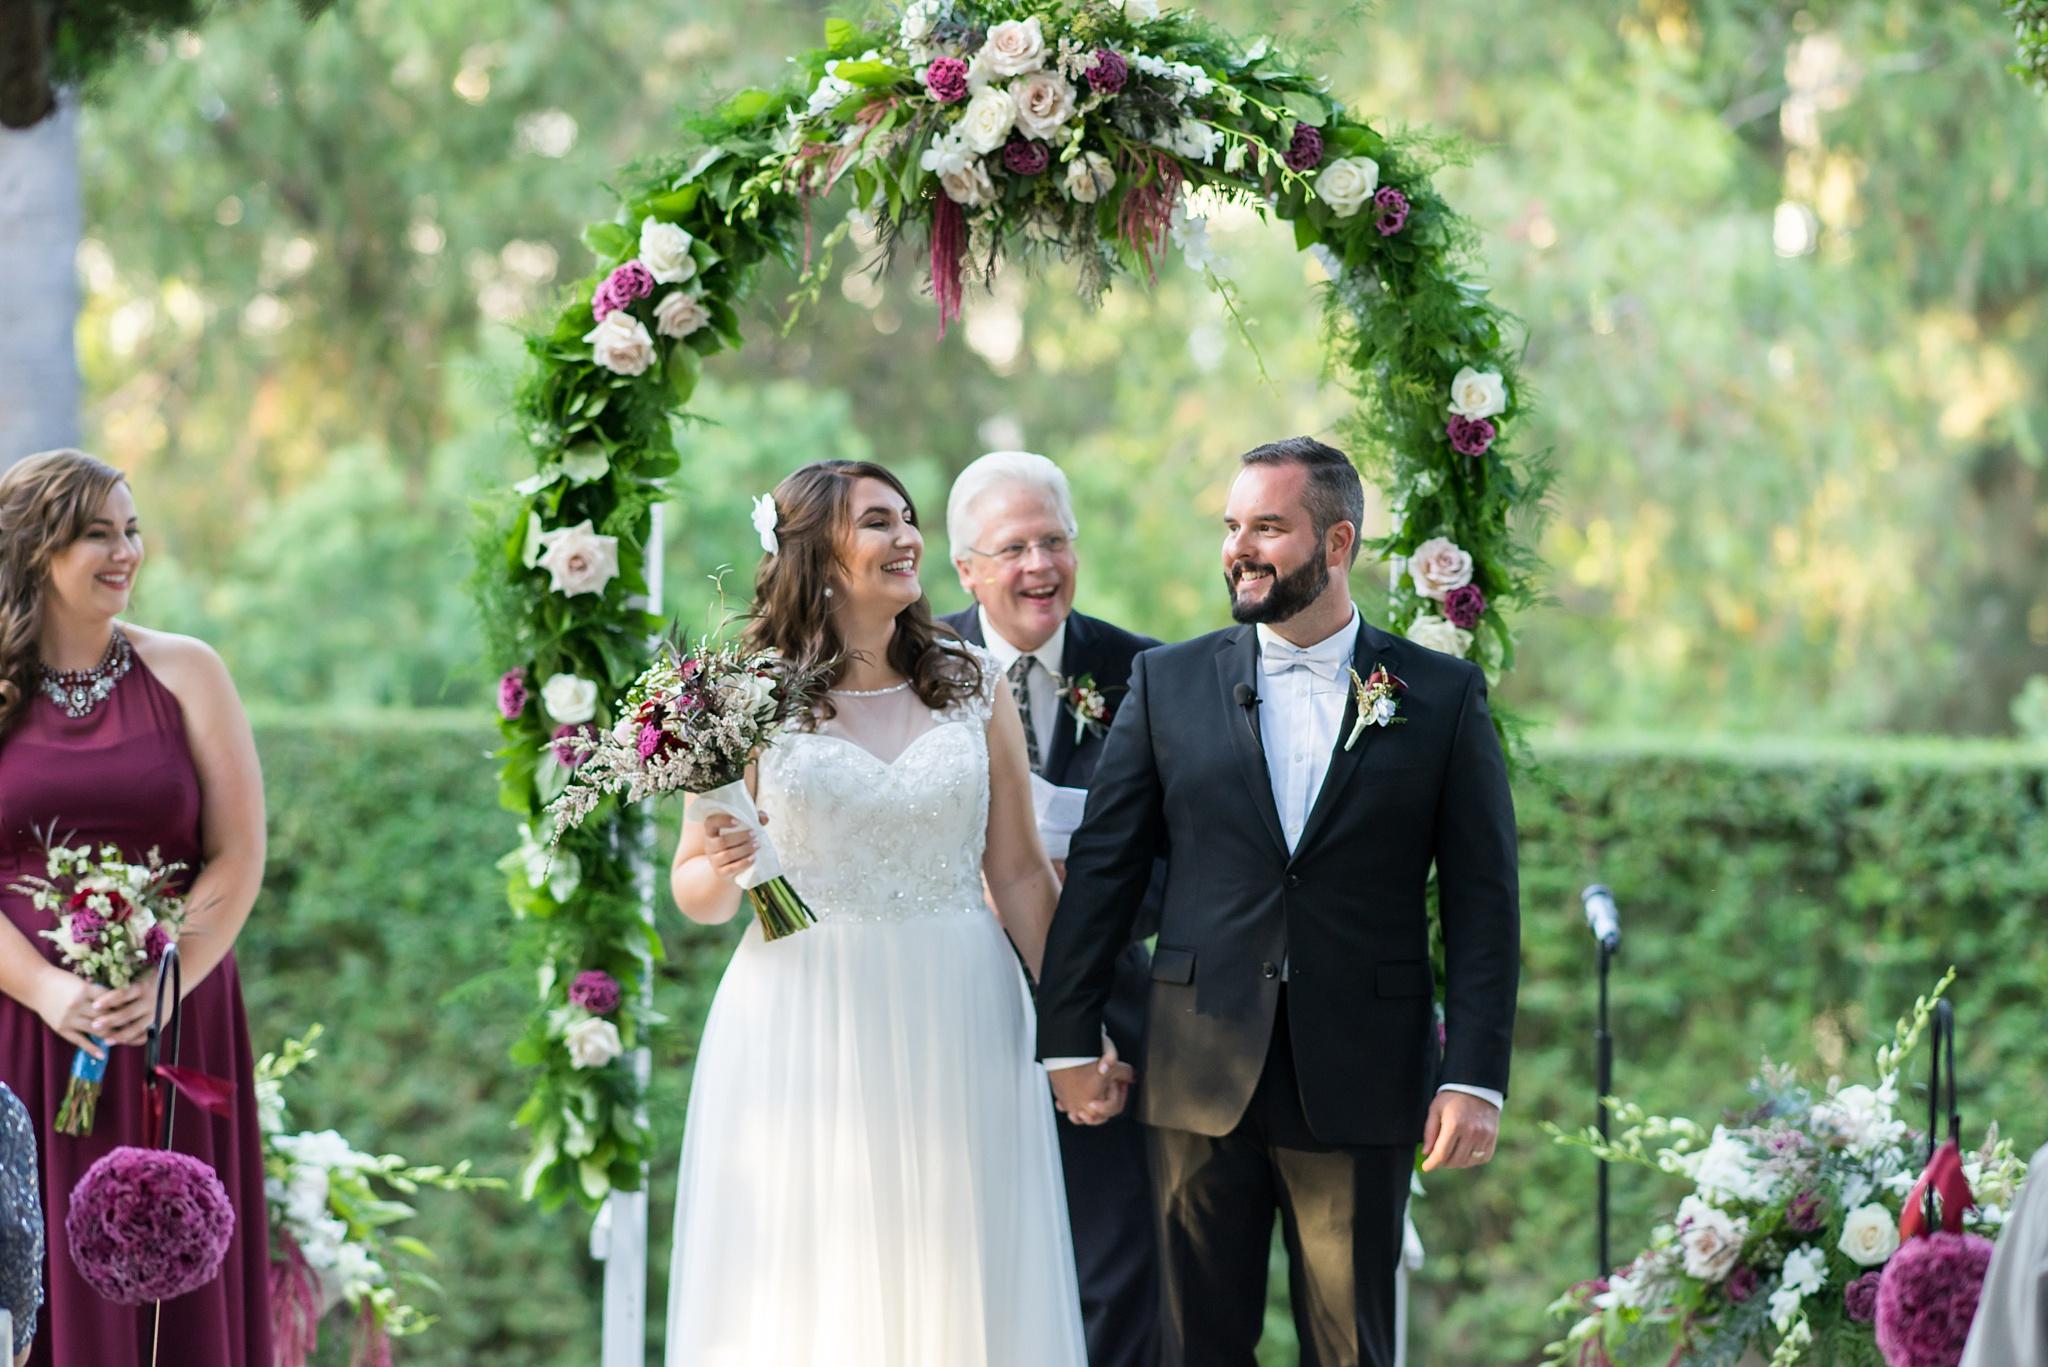 TommyandAmanda_WEDDING_BrienneMichelle_Ceremony_091_BLOG.jpg